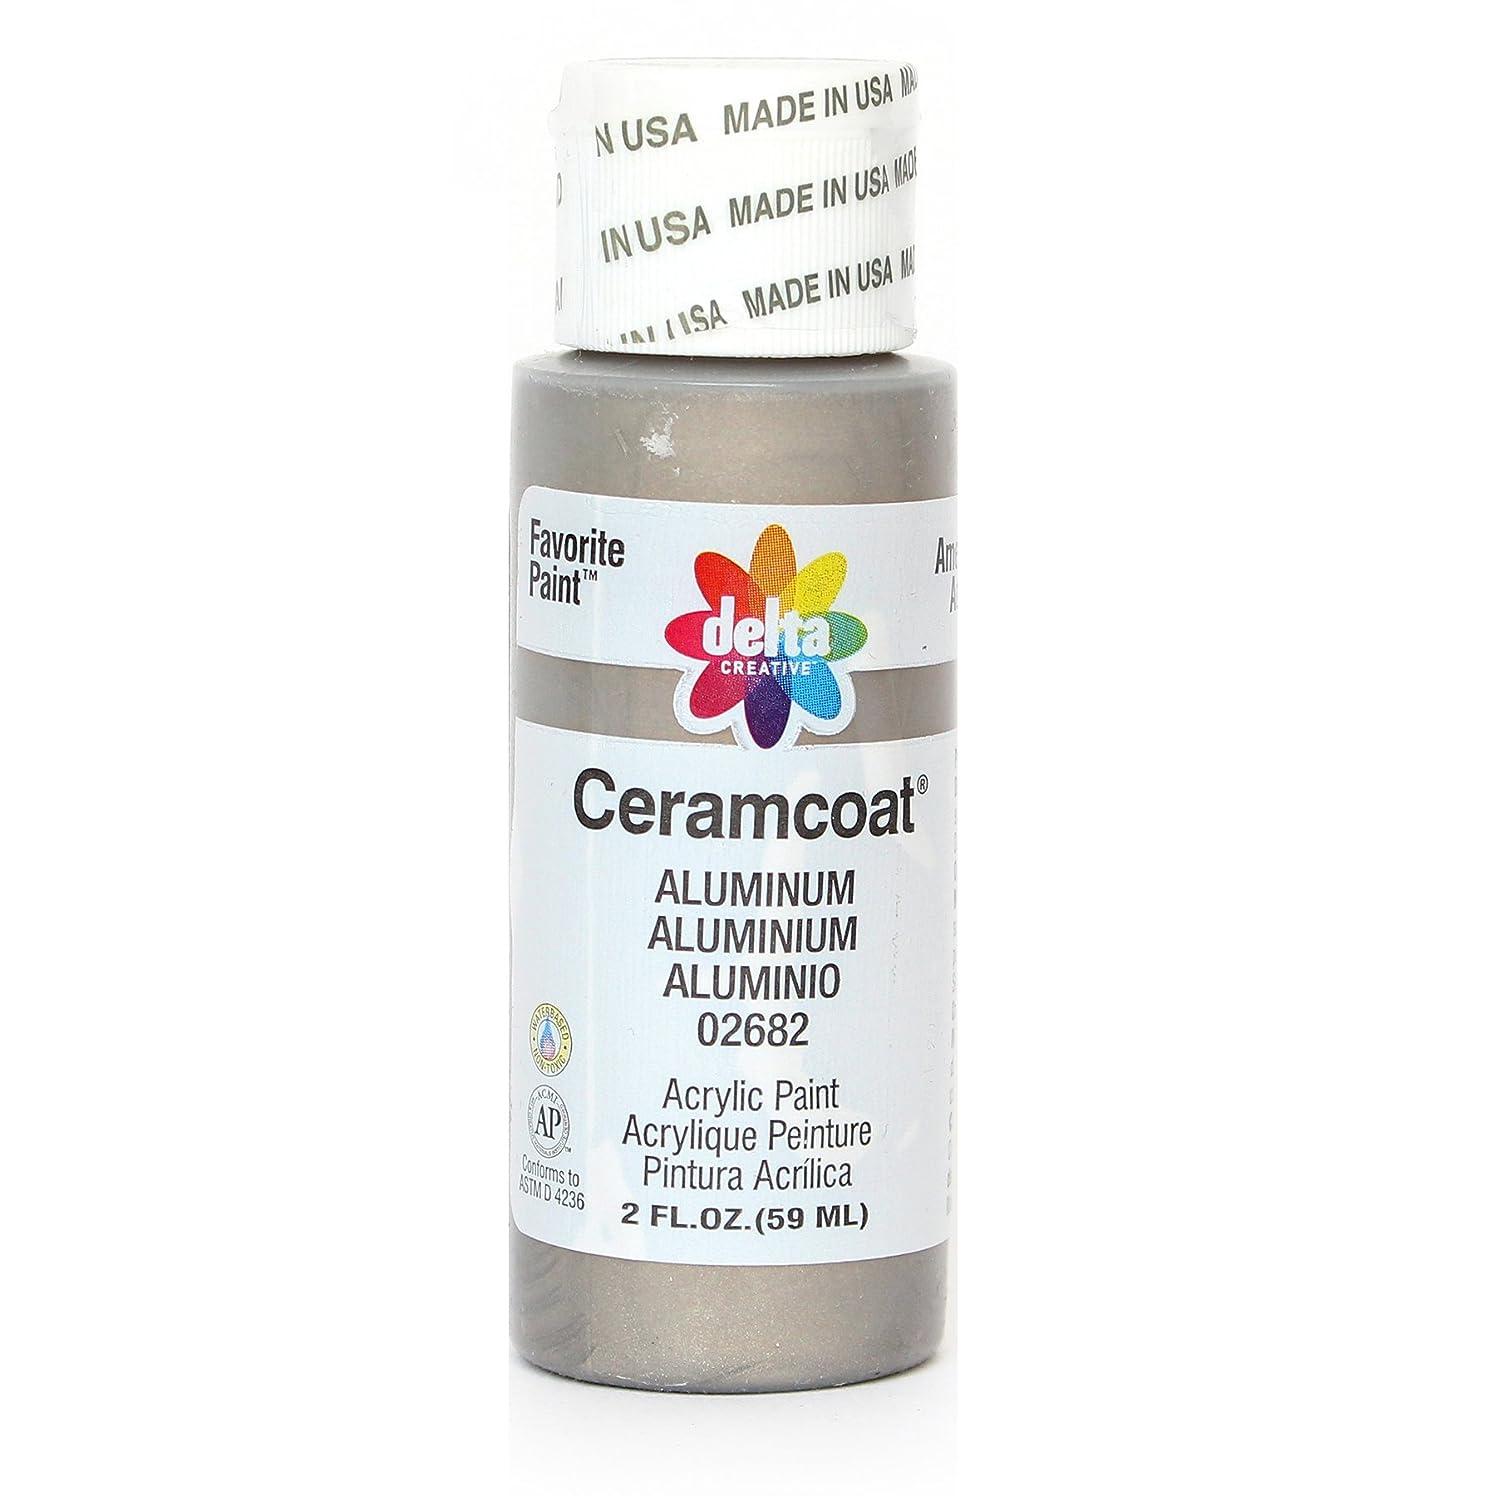 Delta Creative Ceramcoat Acrylic Paint in Assorted Colors (2 oz), 2682, Aluminum